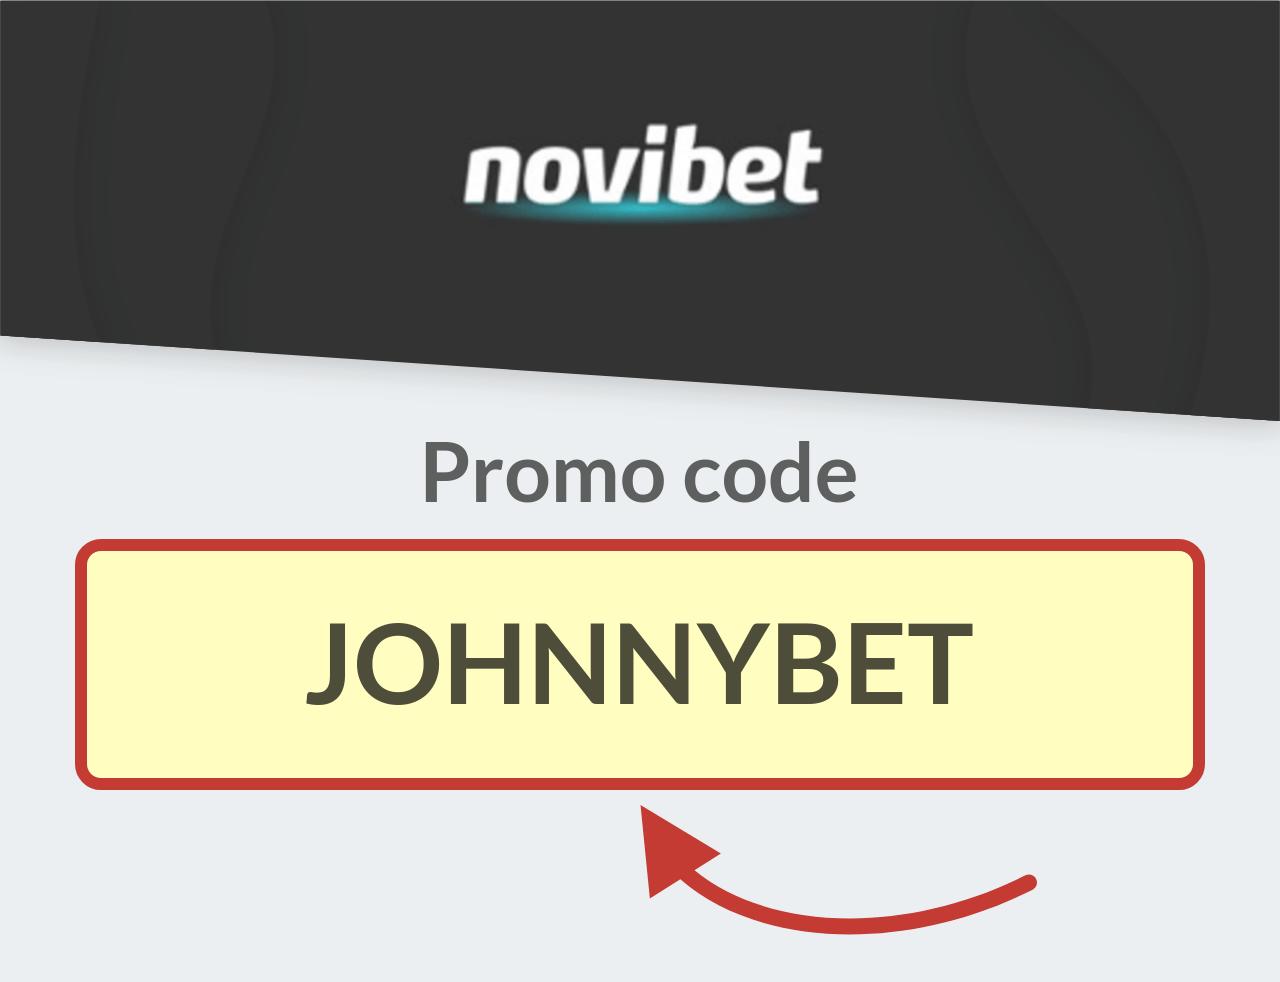 Novibet Promo Code